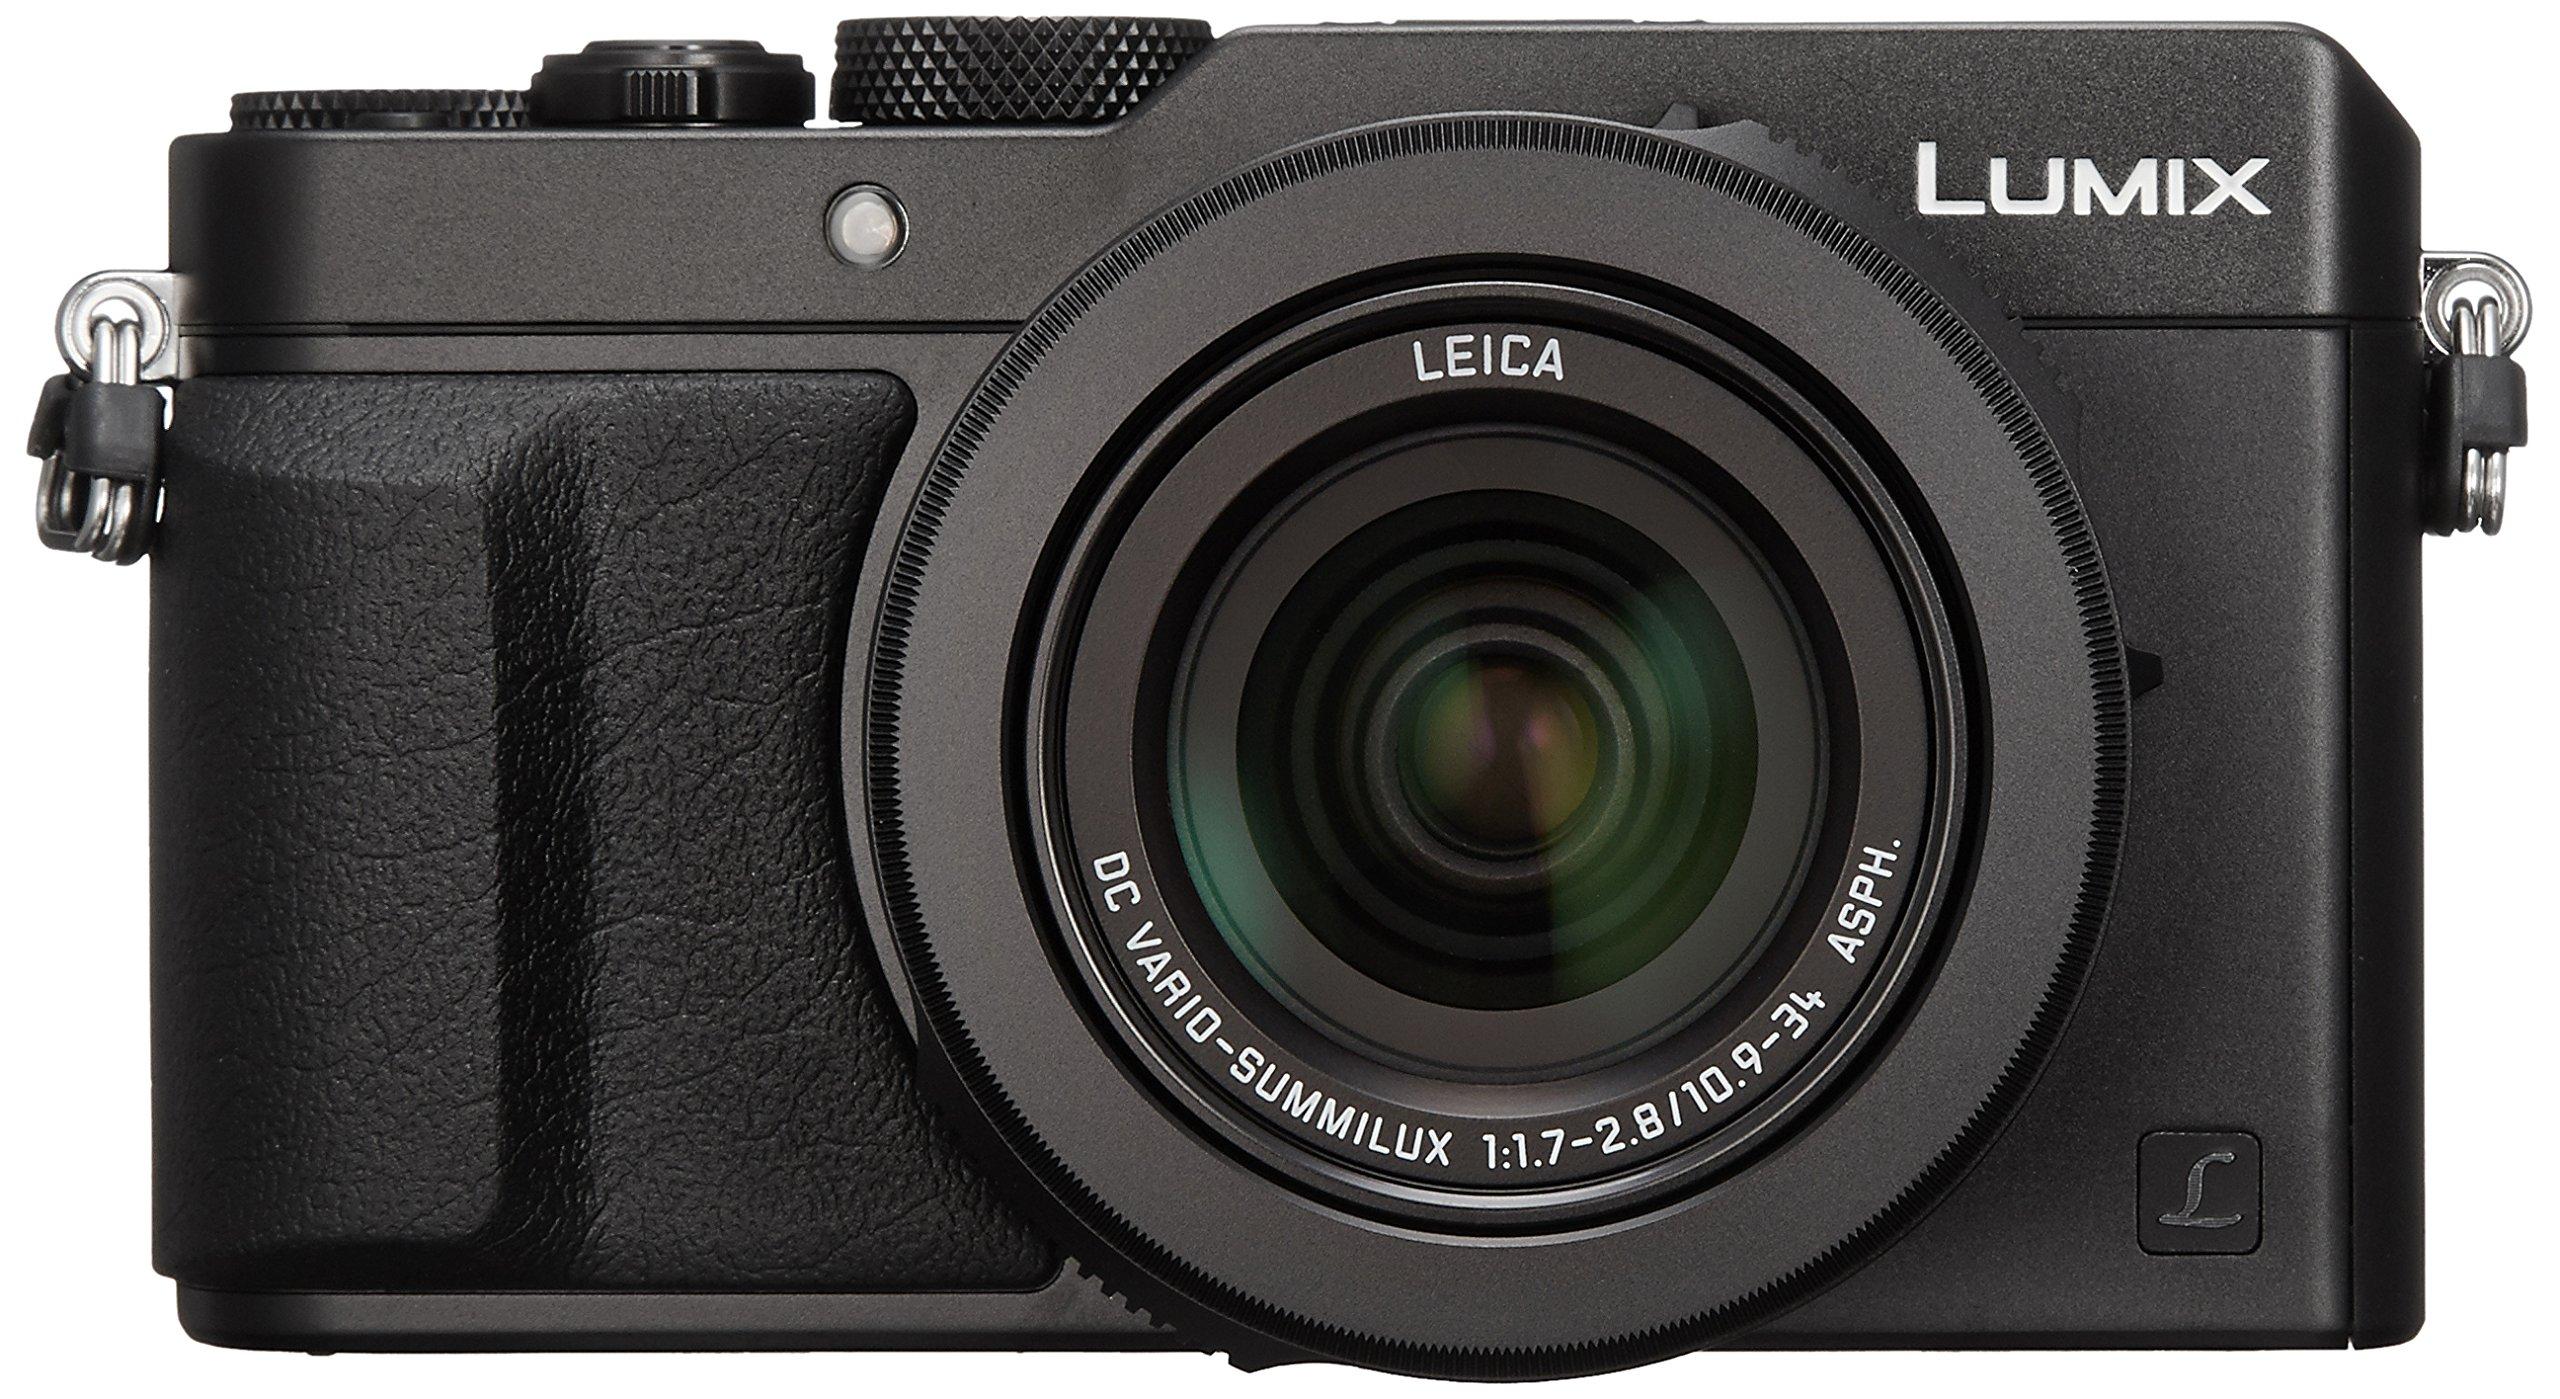 Panasonic Lumix DMC-LX100 Digital Camera, 12.8MP, 3.0-Inch Display, 24-75mm Leica DC Vario-Summilux f/1.7-2.8 Lens, 4K Ultra HD Video, HDMI/USB, Wi-Fi, NFC (Black) - International Version by Panasonic